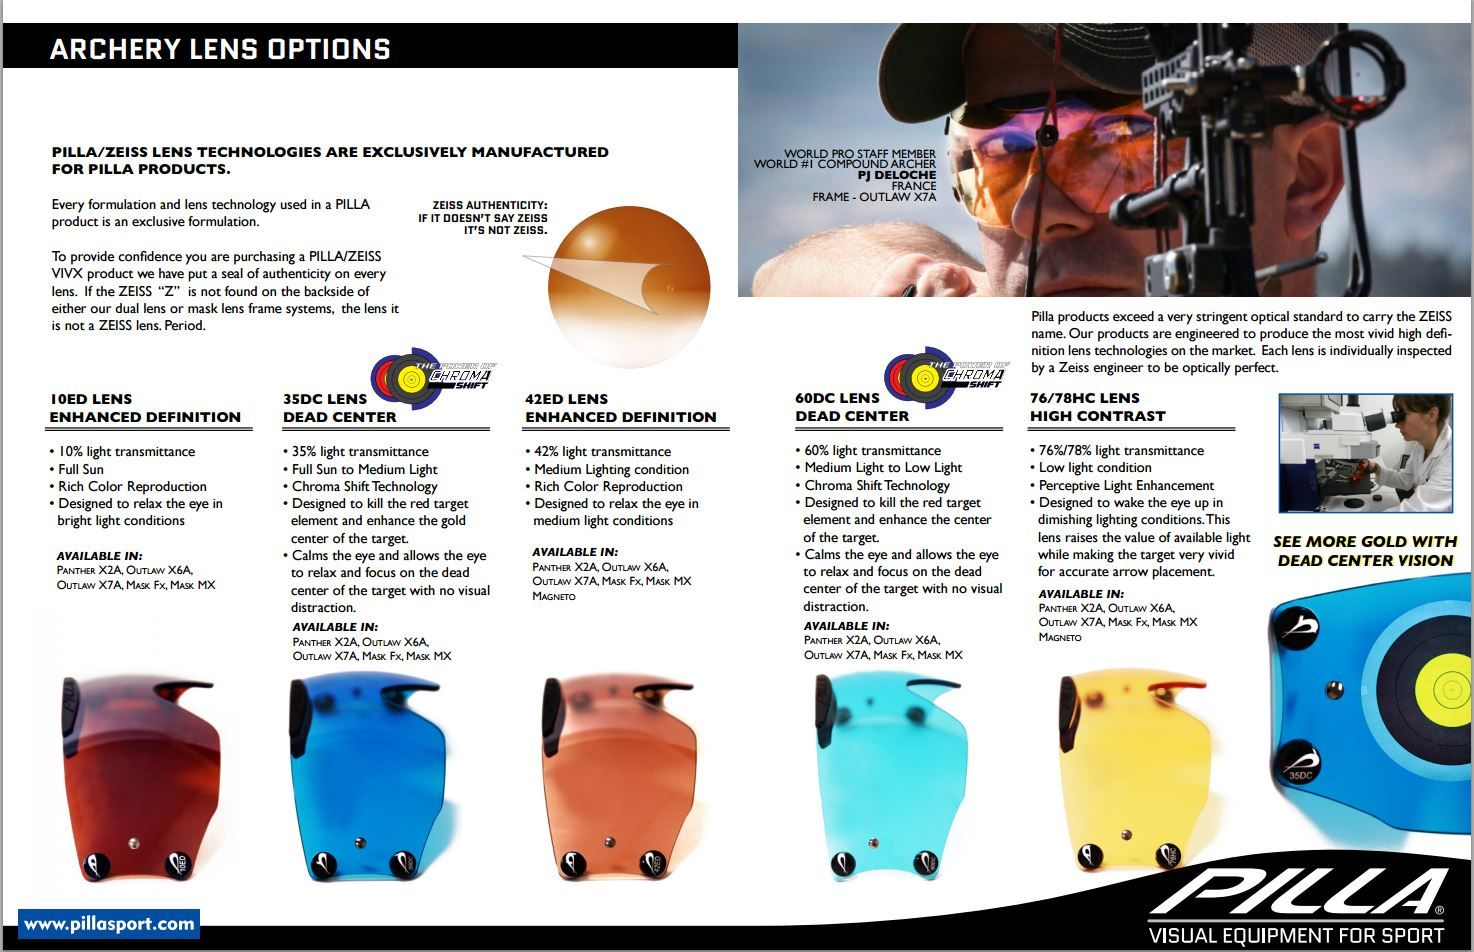 Archery Lens Options pilla pillasport